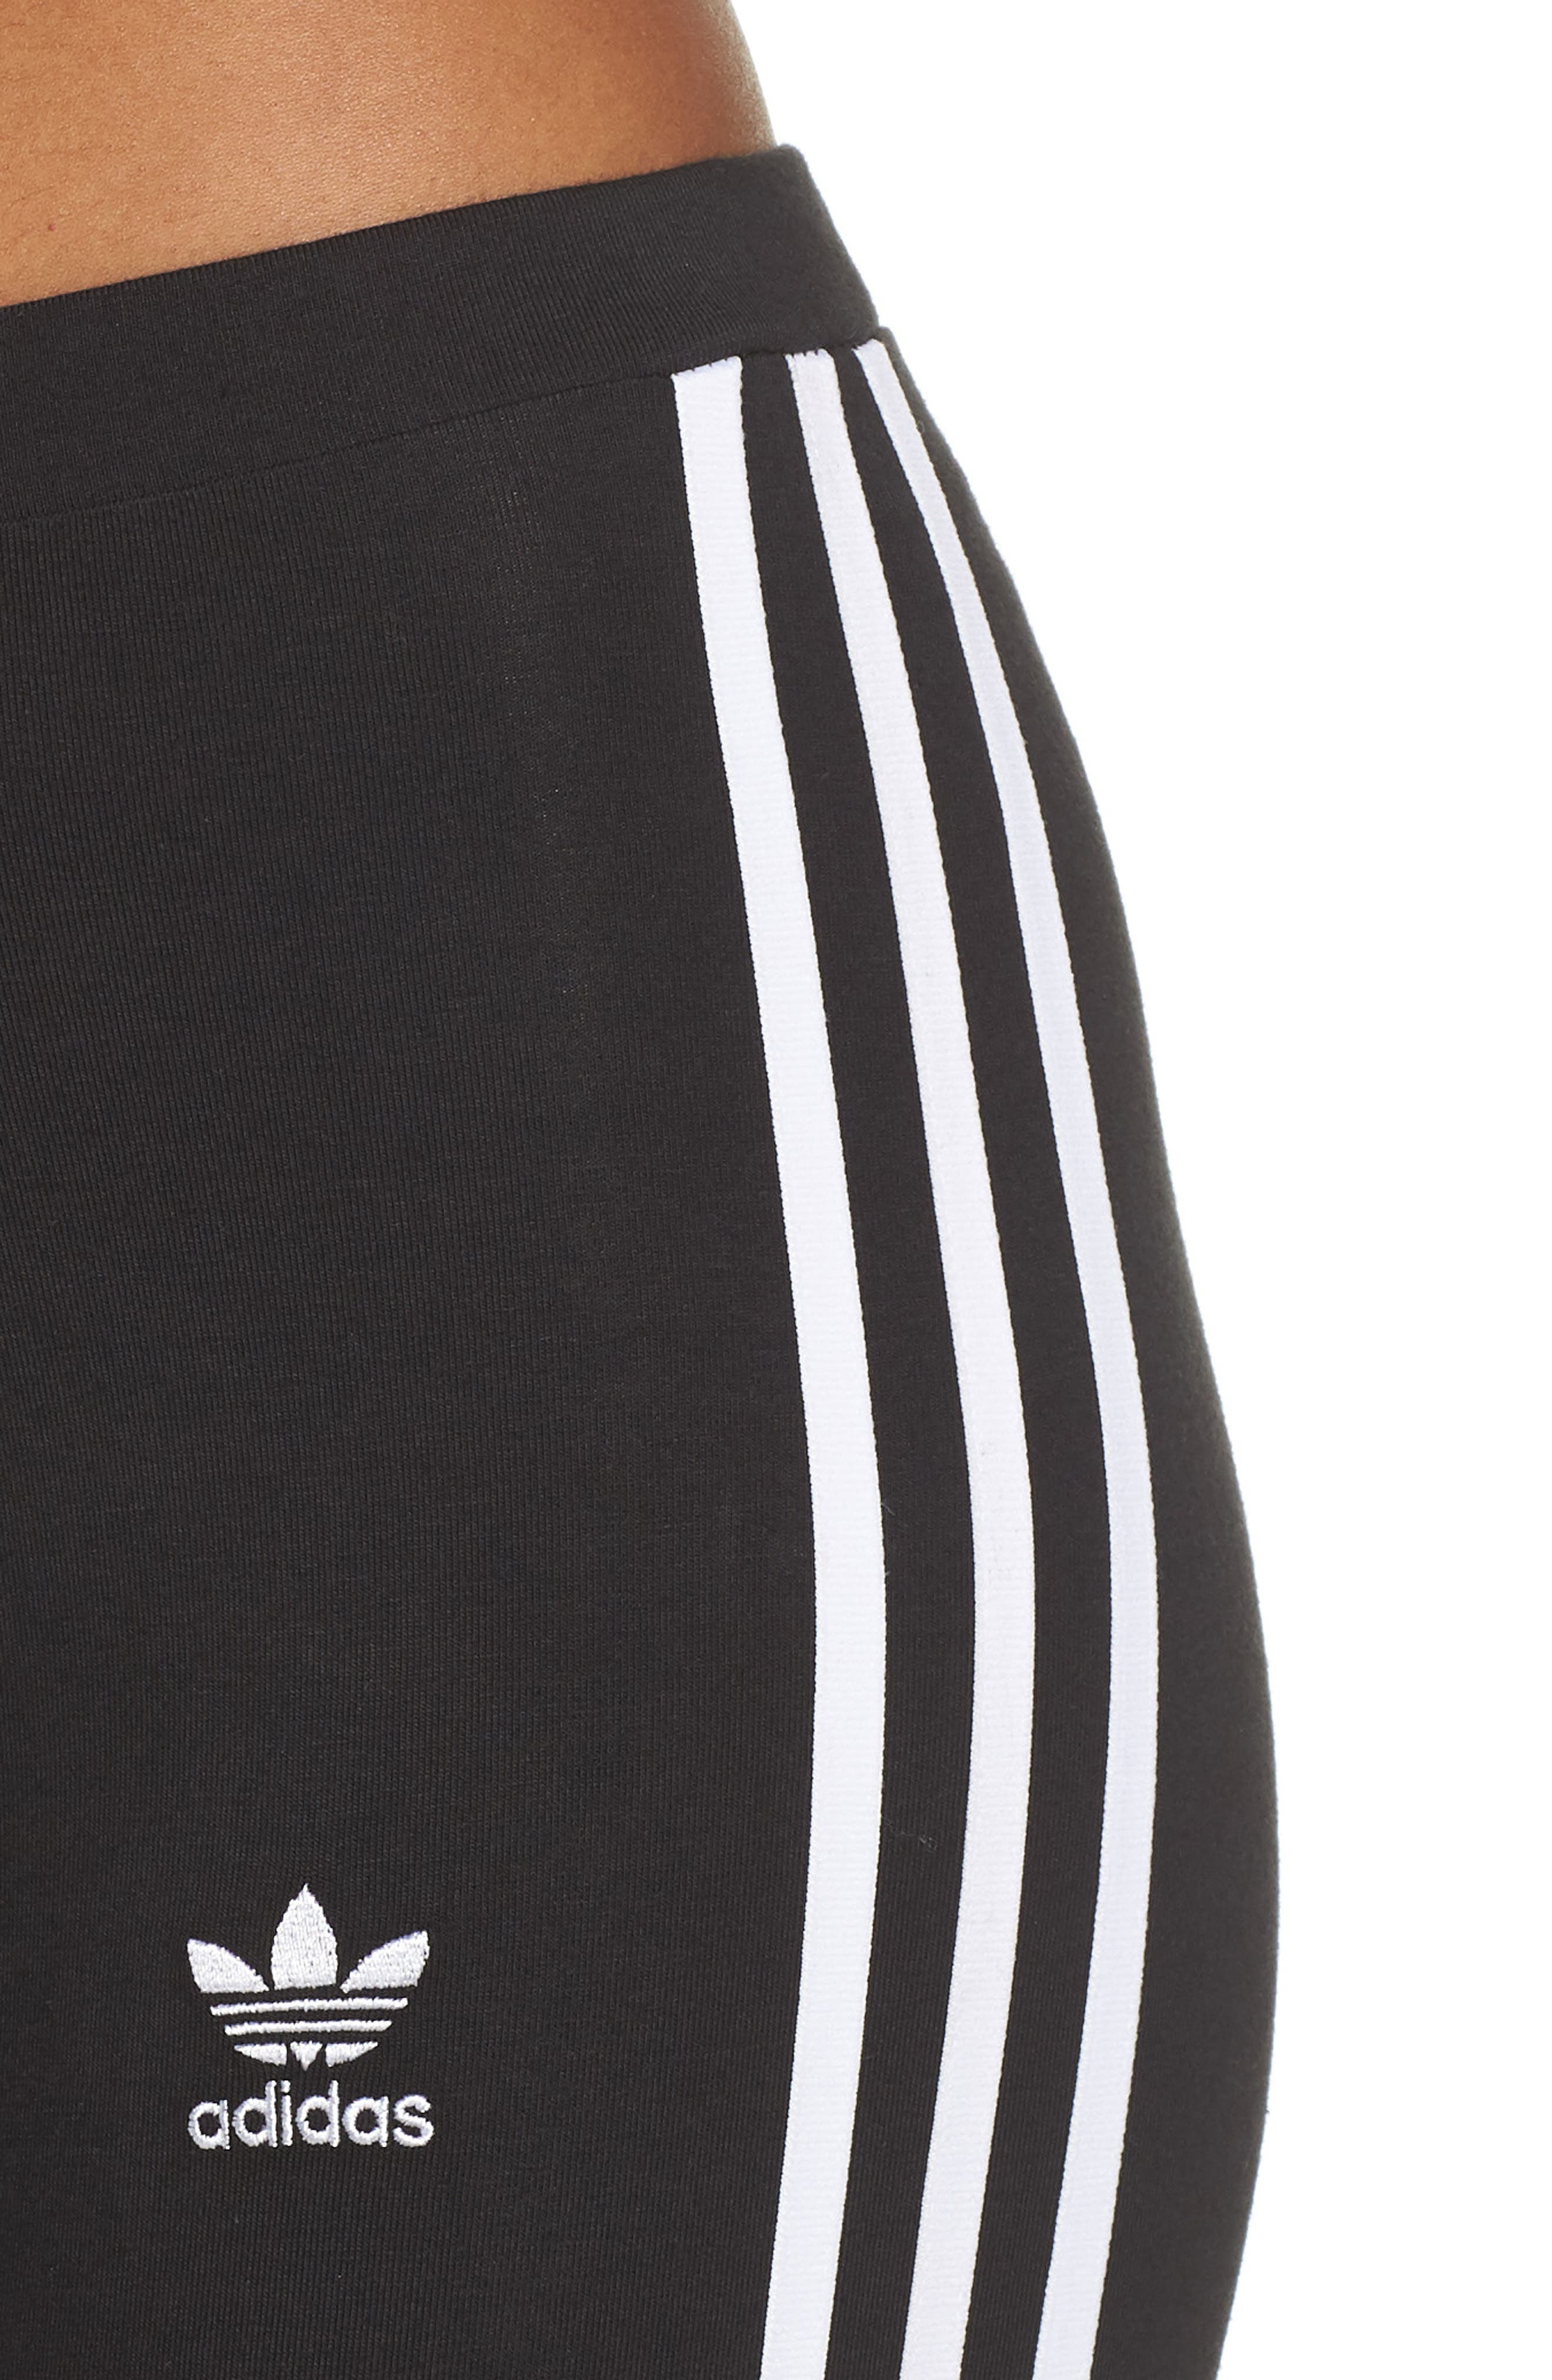 ADIDAS ORIGINALS, adidas 3-Stripes Tights, Alternate thumbnail 5, color, 001